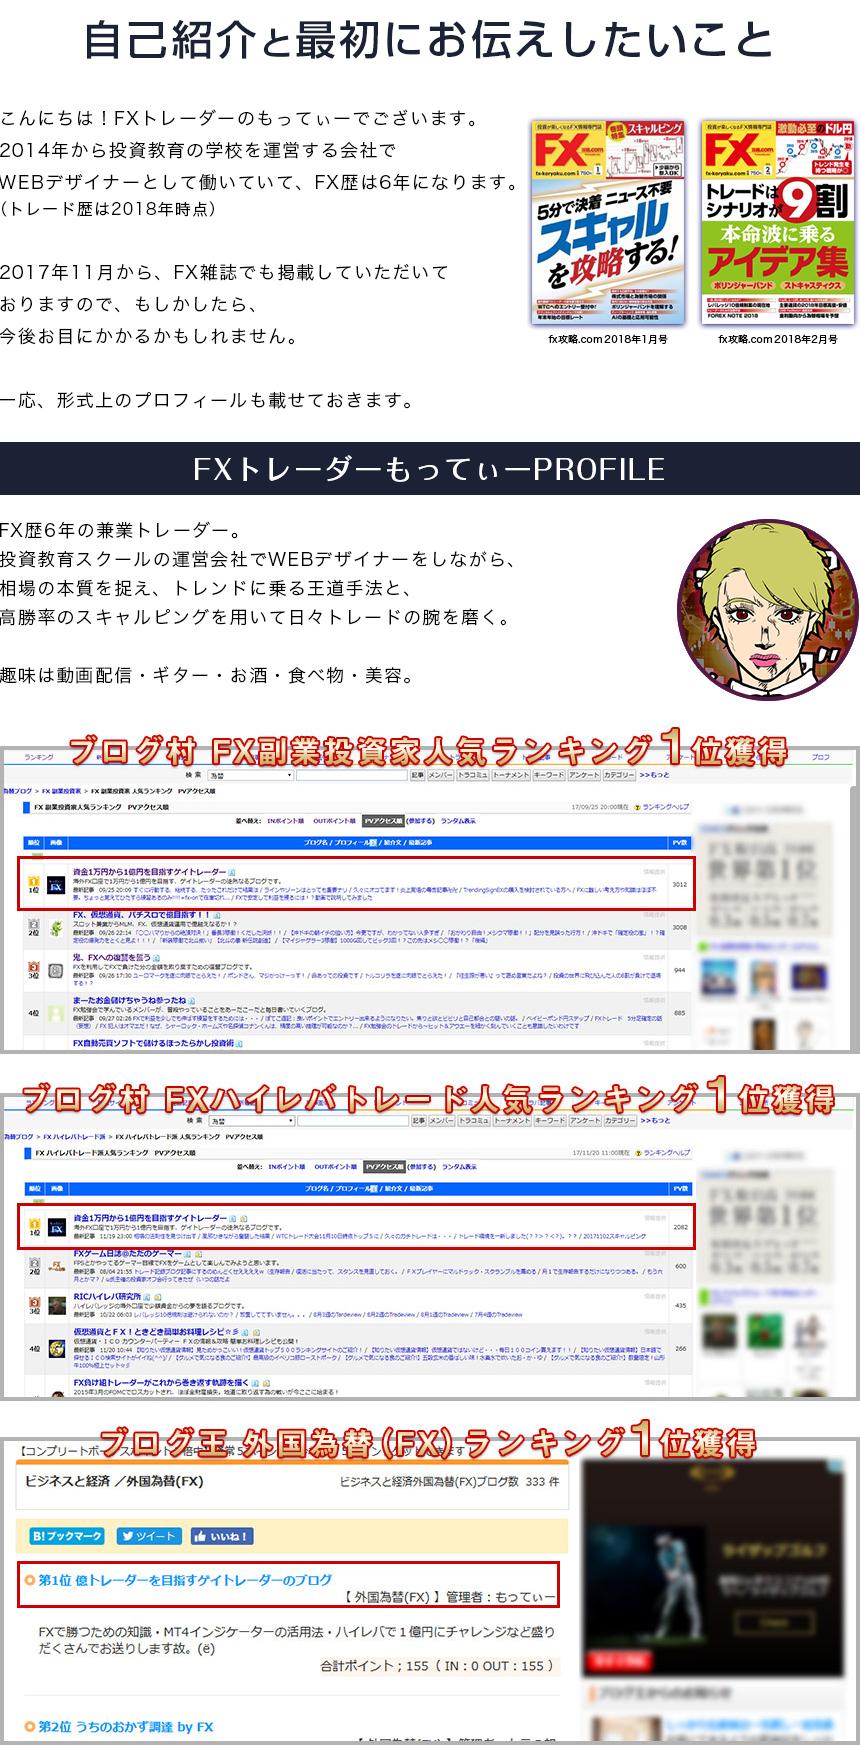 prof_04.jpg